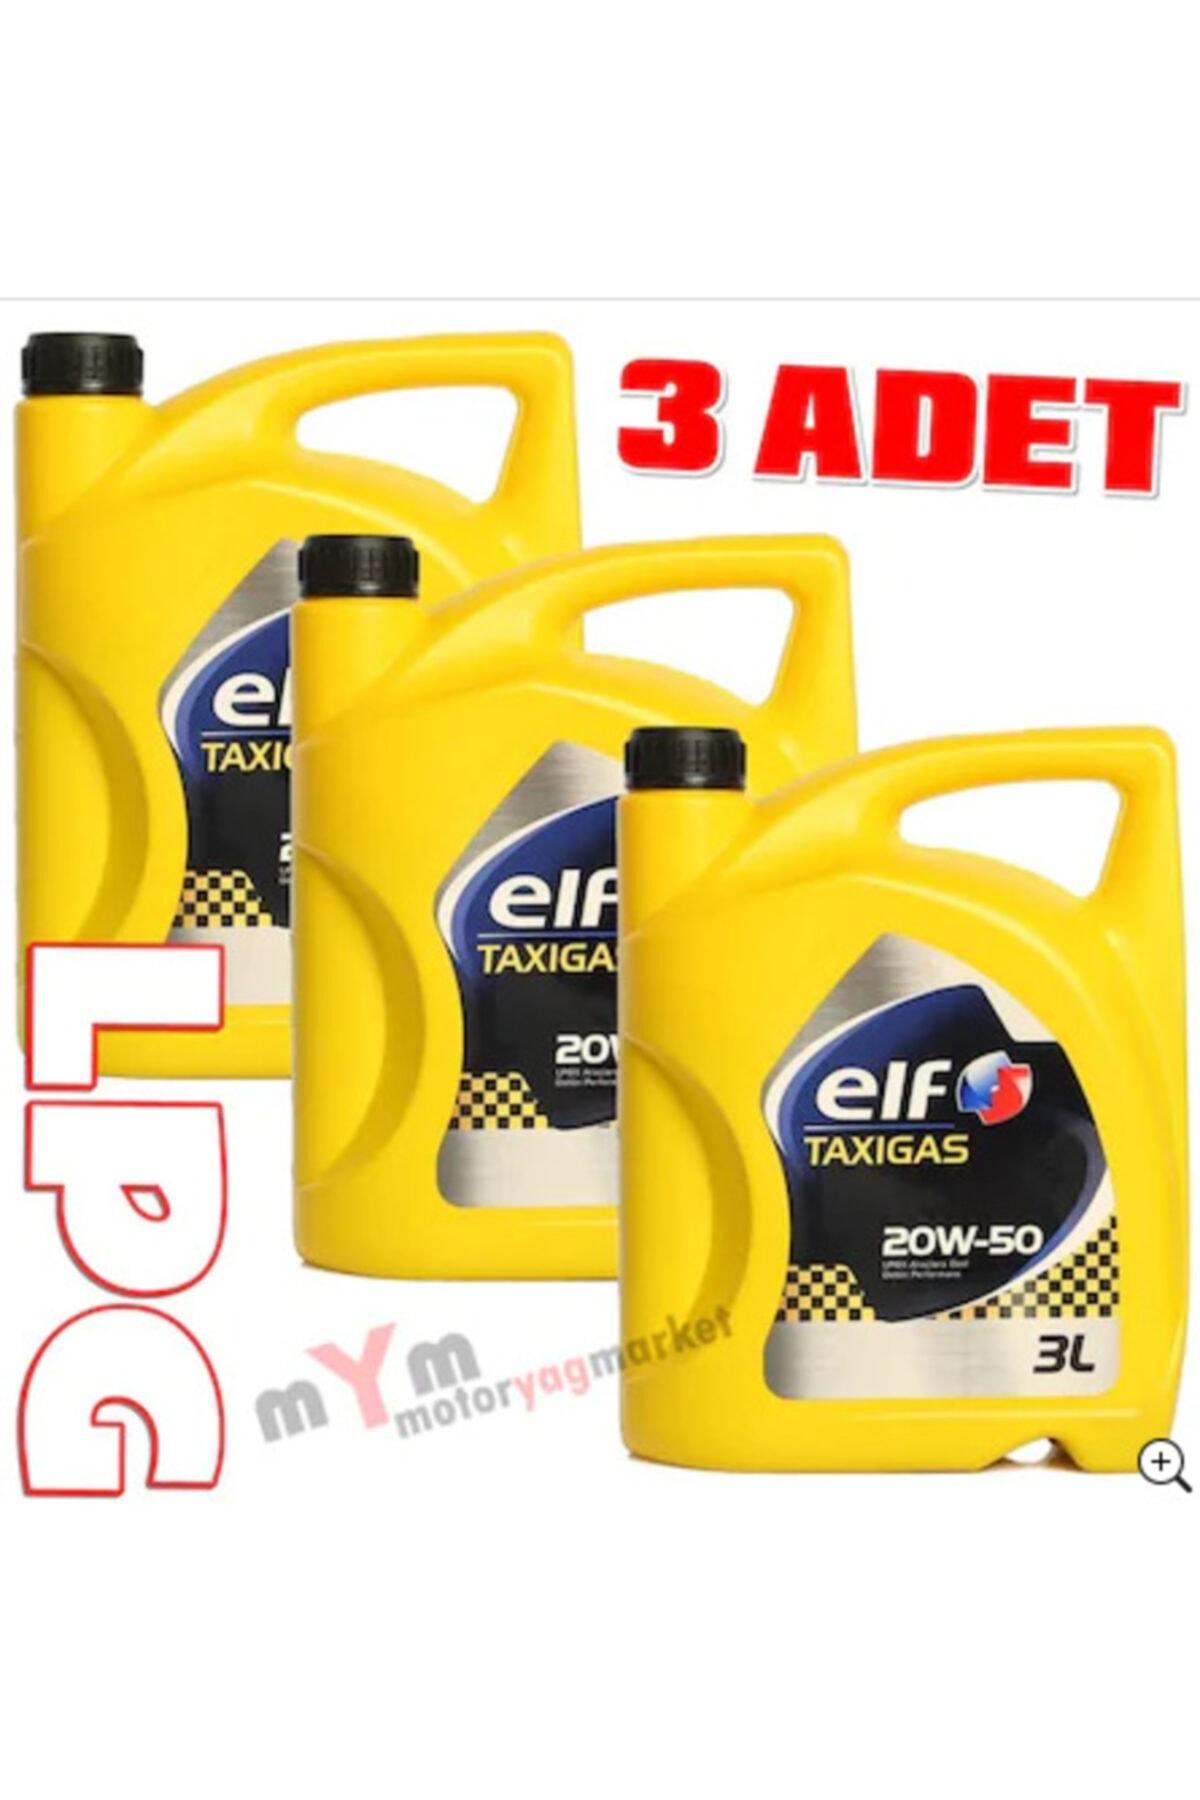 ELF Taxigas Lpg 20w-50 3 Litre Lpgli Araç Motor Yağı *3 Adet 1